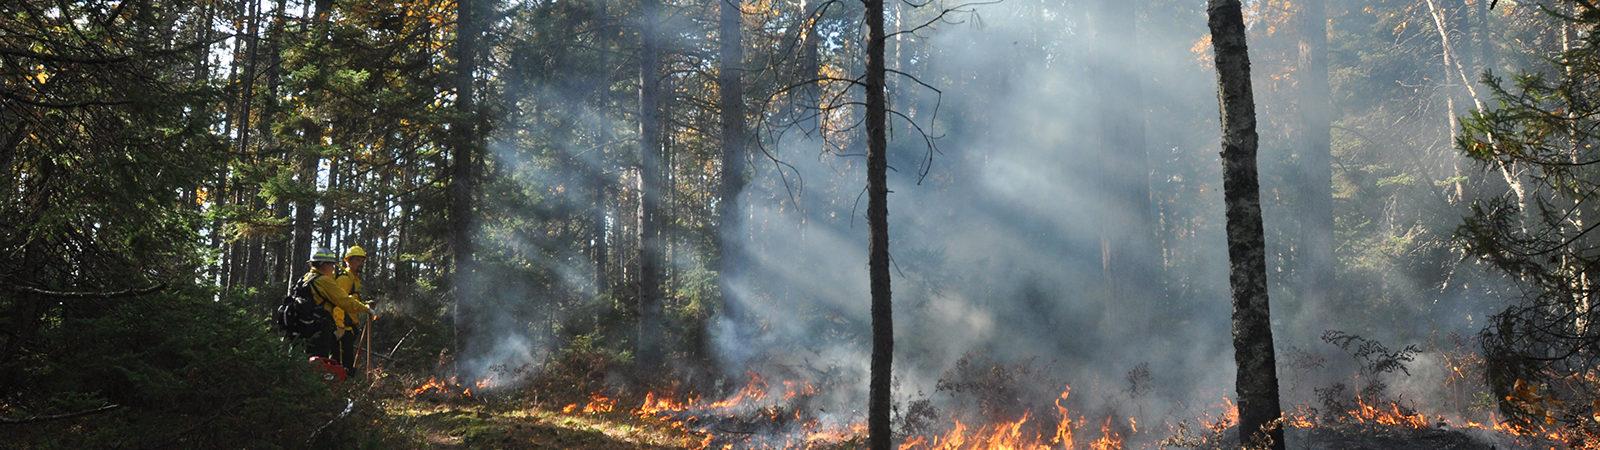 Controlled burn on Apostle Islands